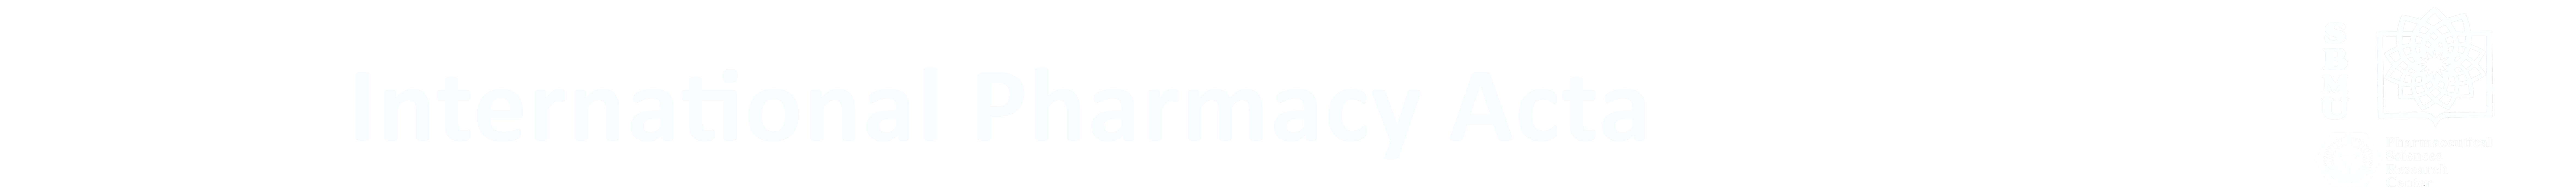 International Pharmacy Acta